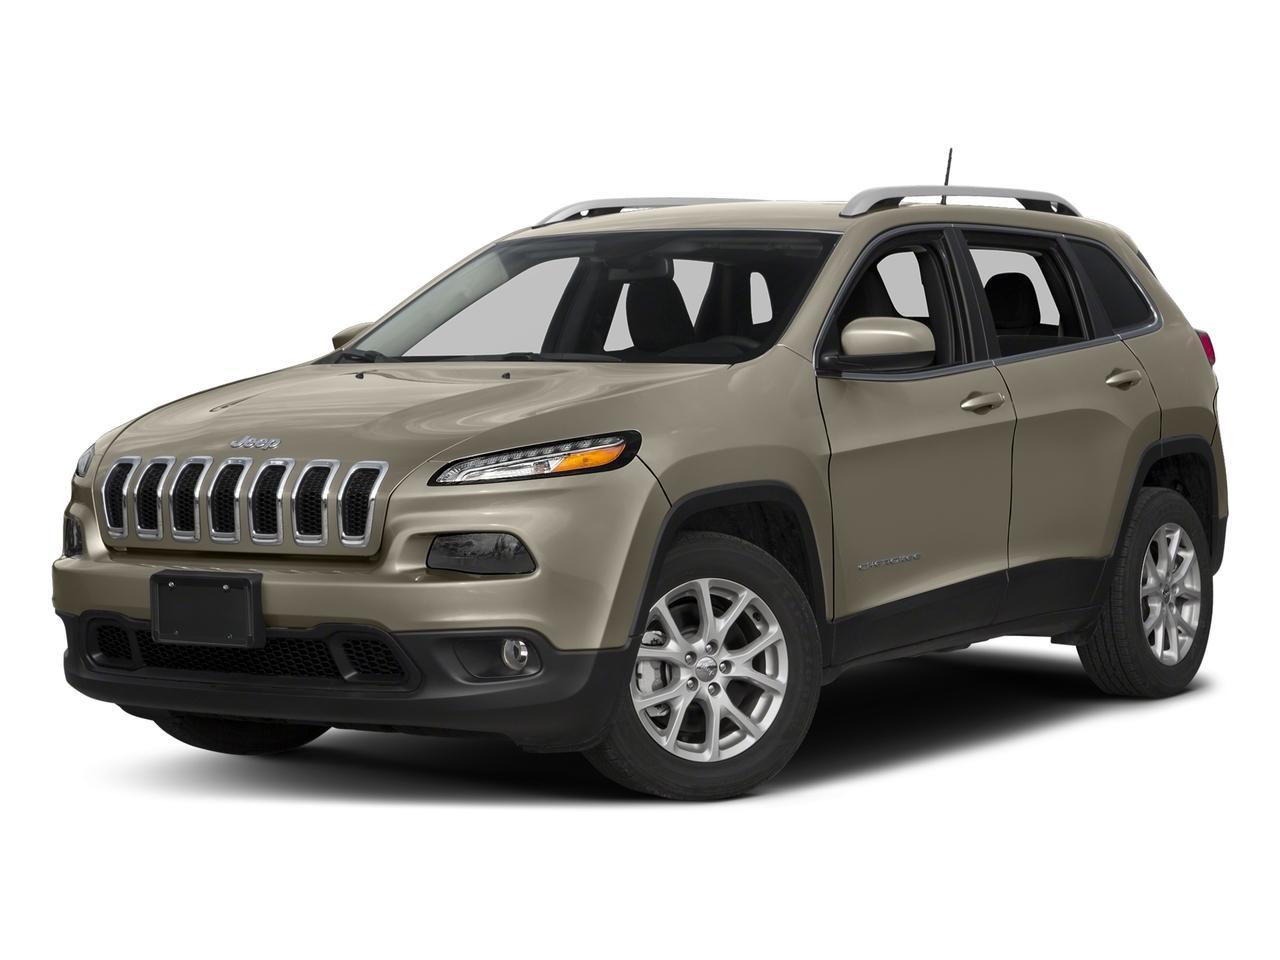 2018 Jeep Cherokee Vehicle Photo in San Antonio, TX 78230